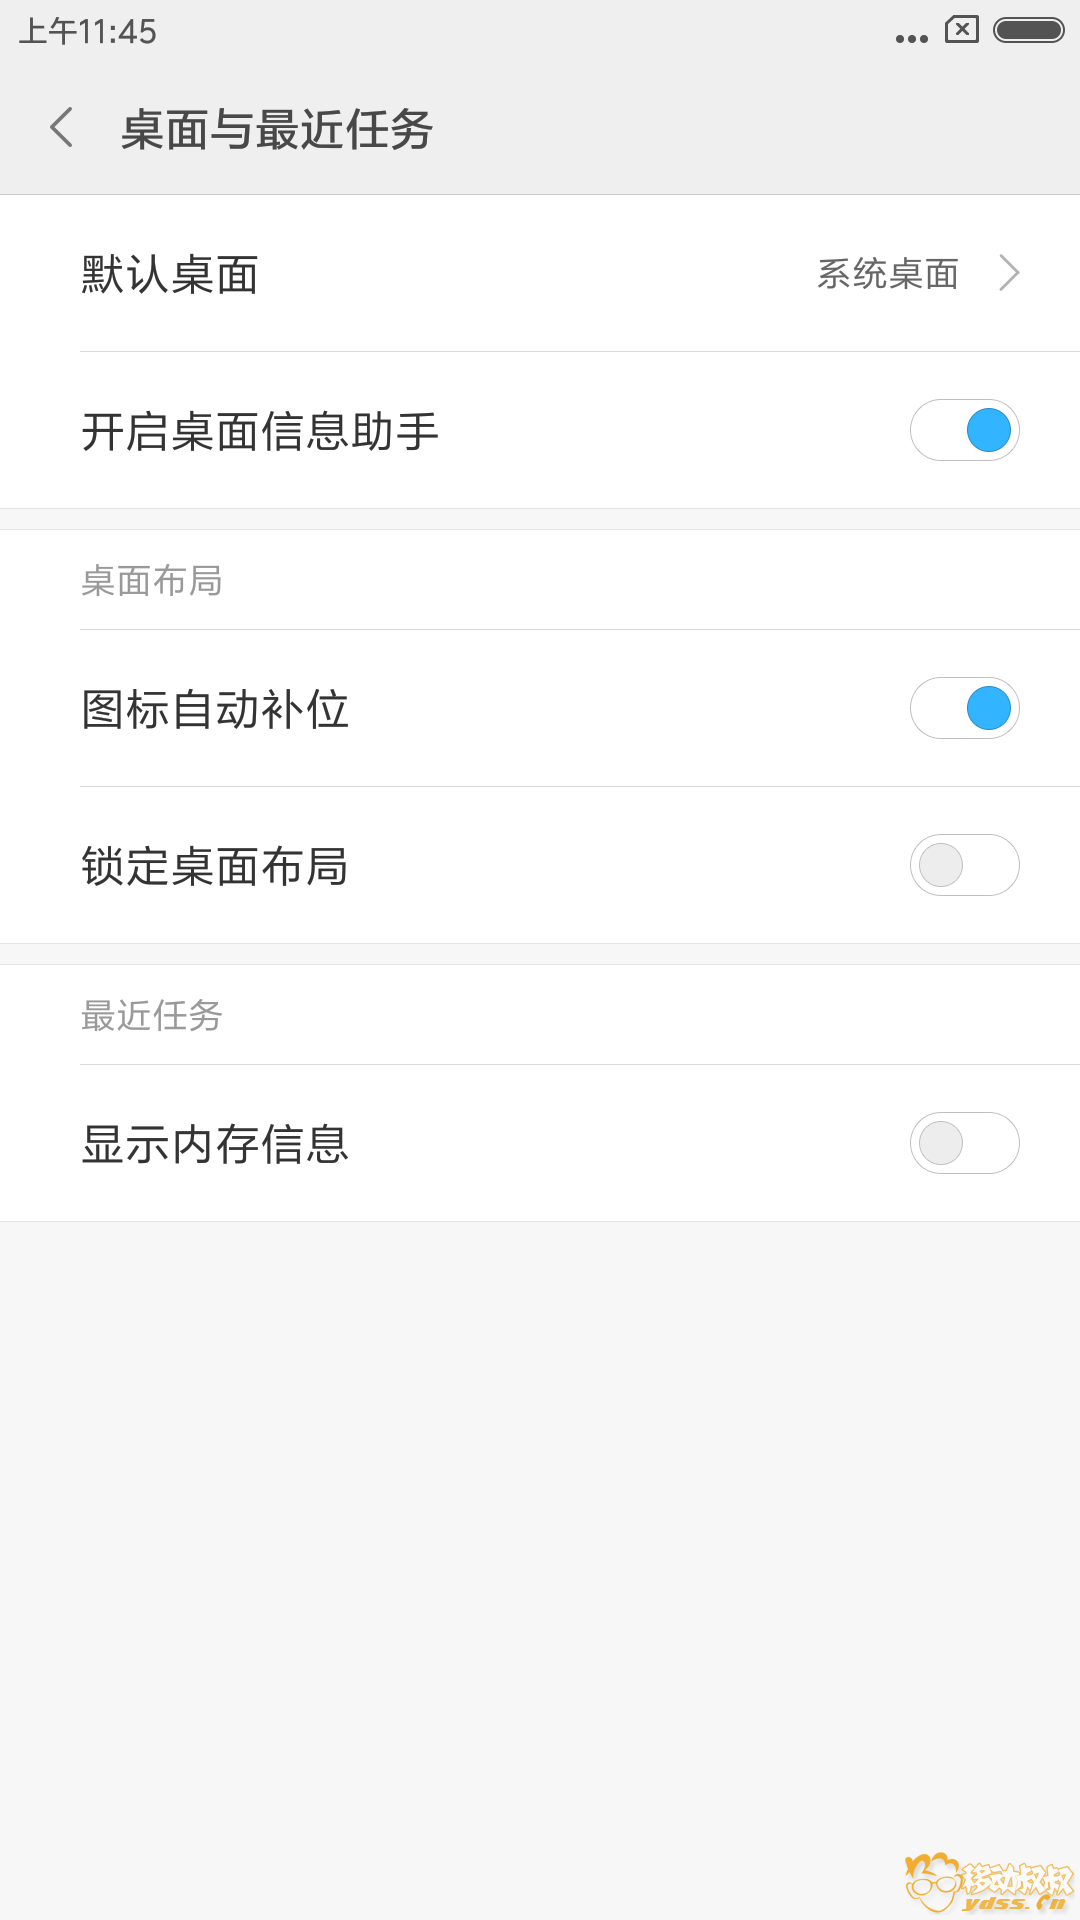 Screenshot_2018-01-07-11-45-39-189_com.android.se.png